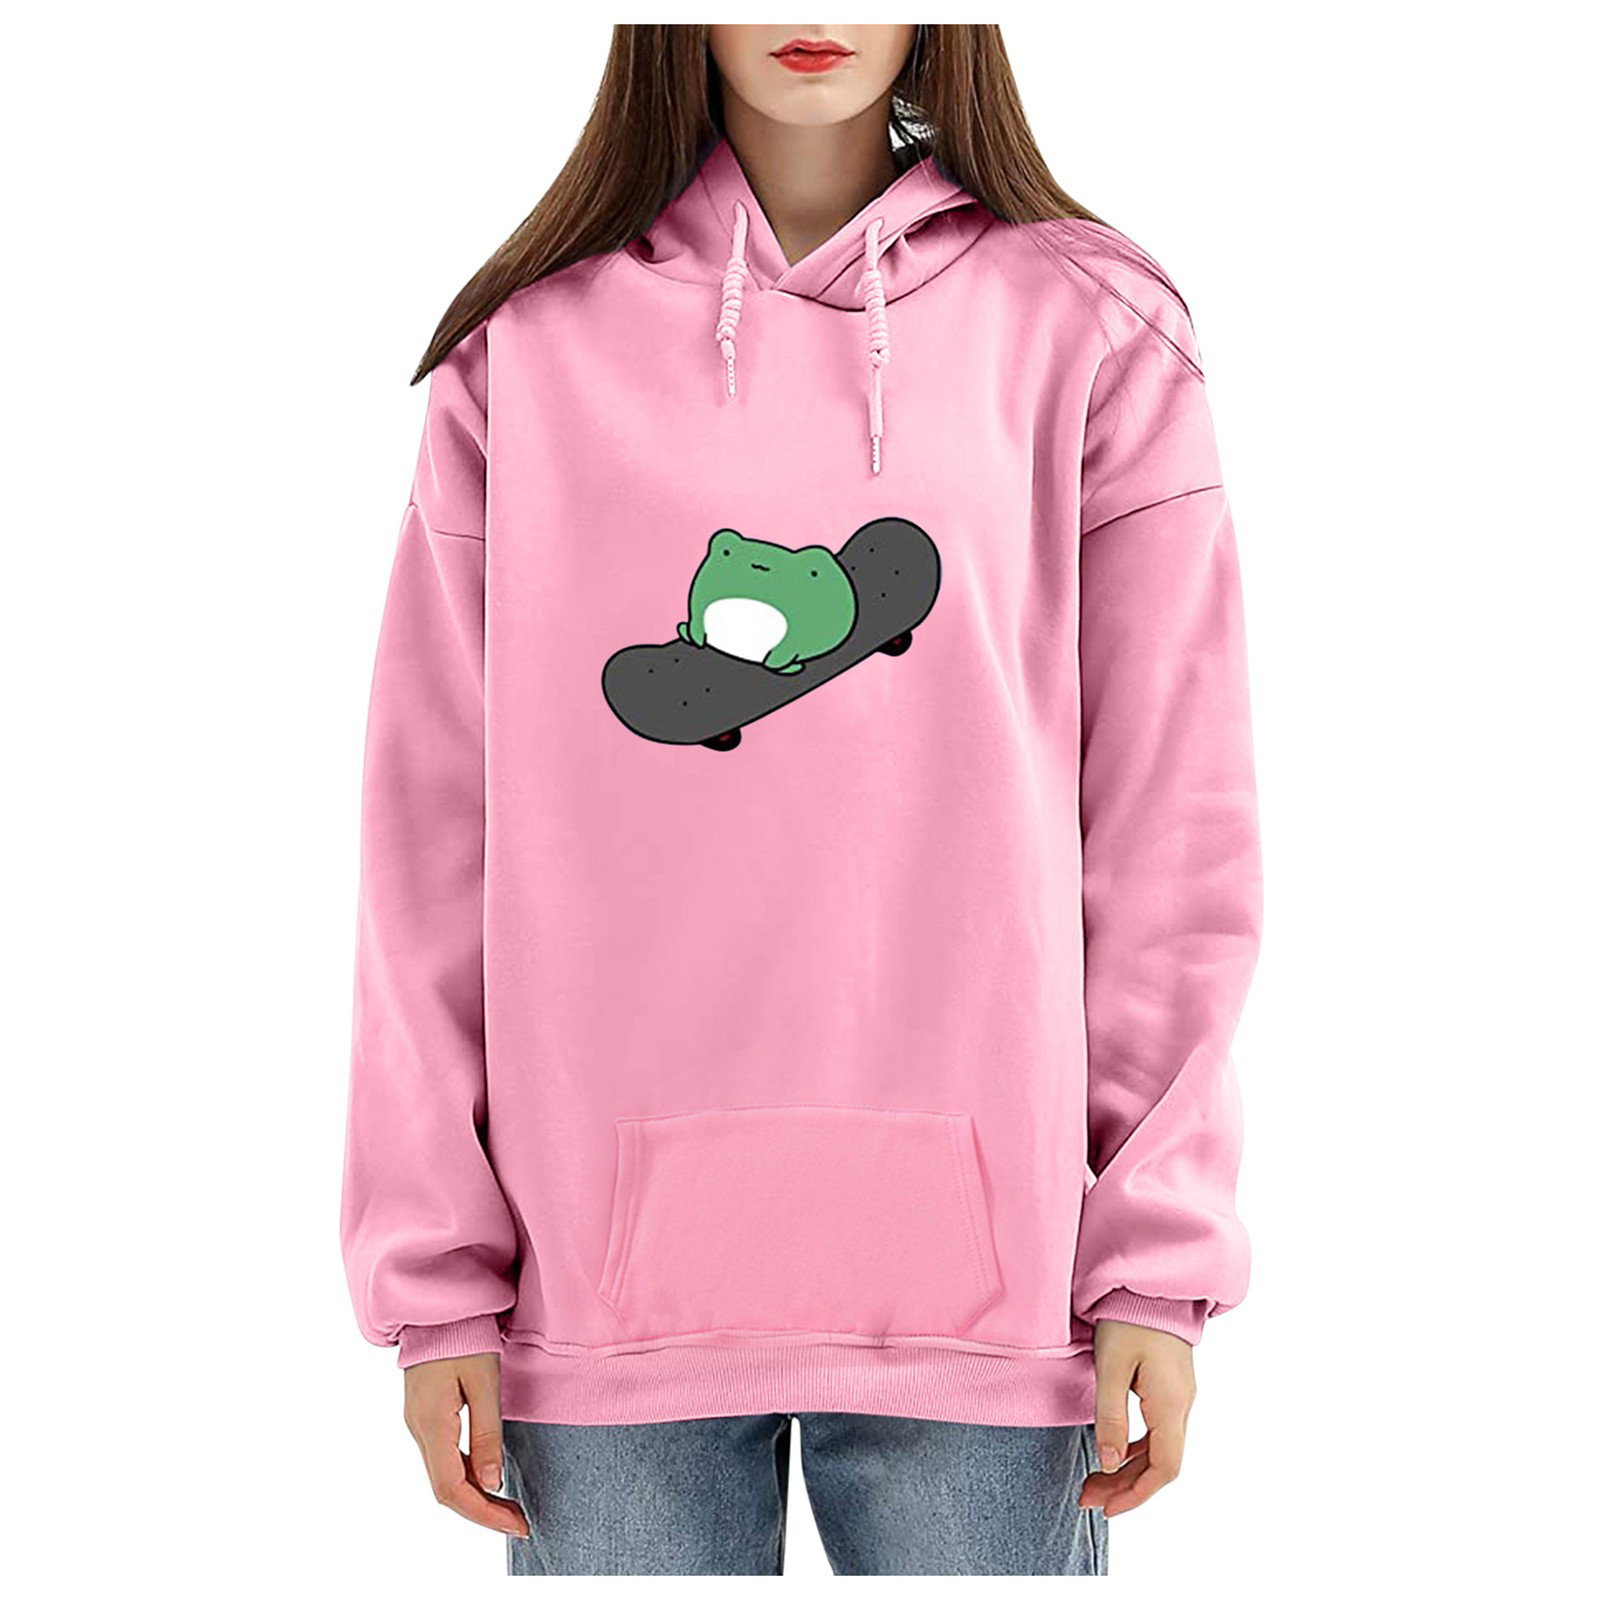 harajuku aesthetic bear anime hoodie women korean kawaii crewneck long sleeve oversized fall winter clothes kpop streetwear tops 16